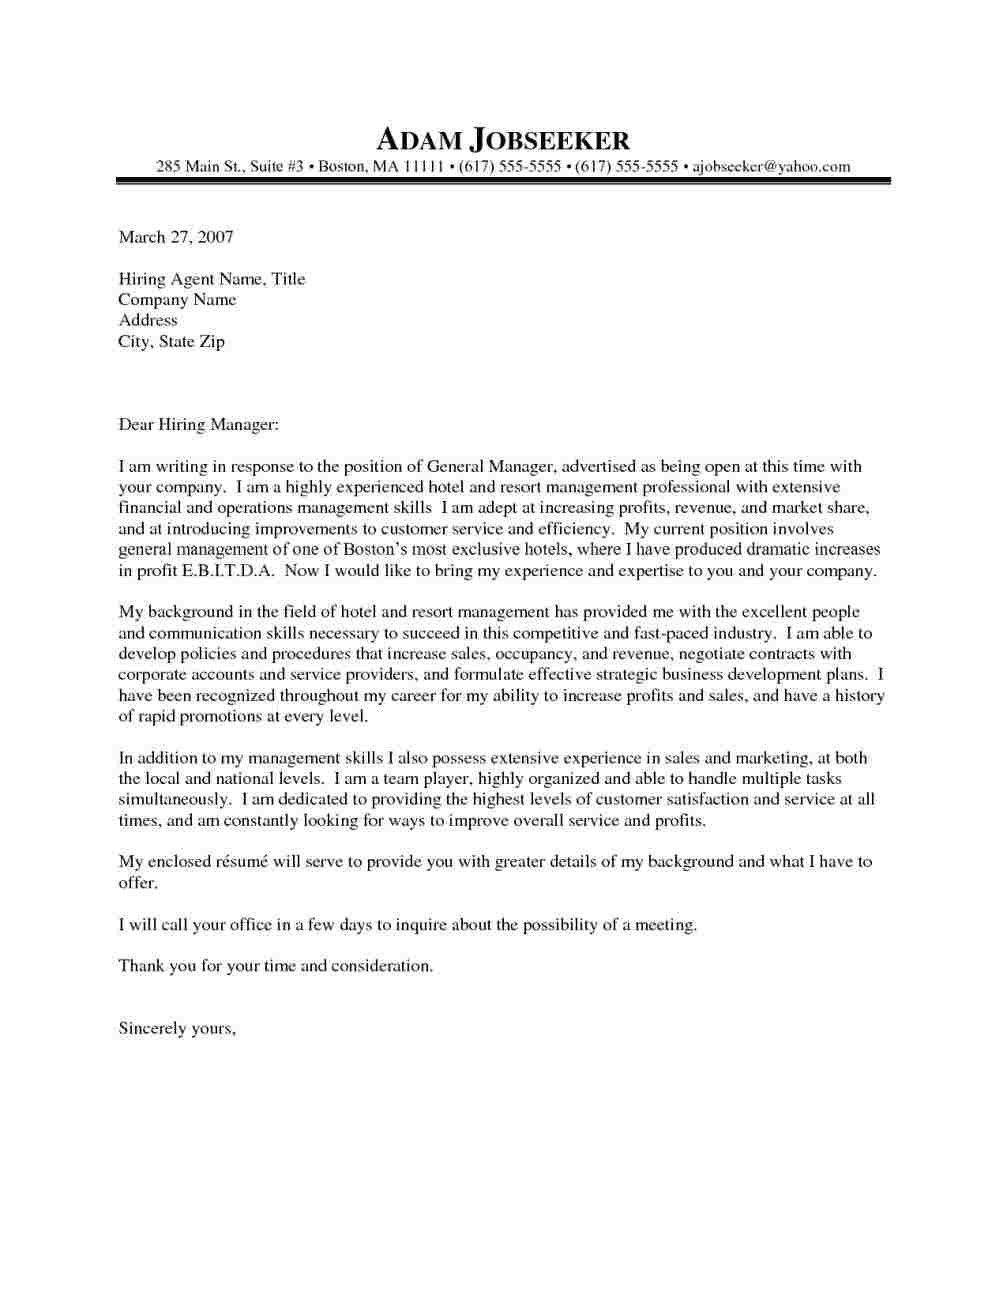 Florida Apostille Cover Letter Sample Apostille Cover Letter Cover Letter